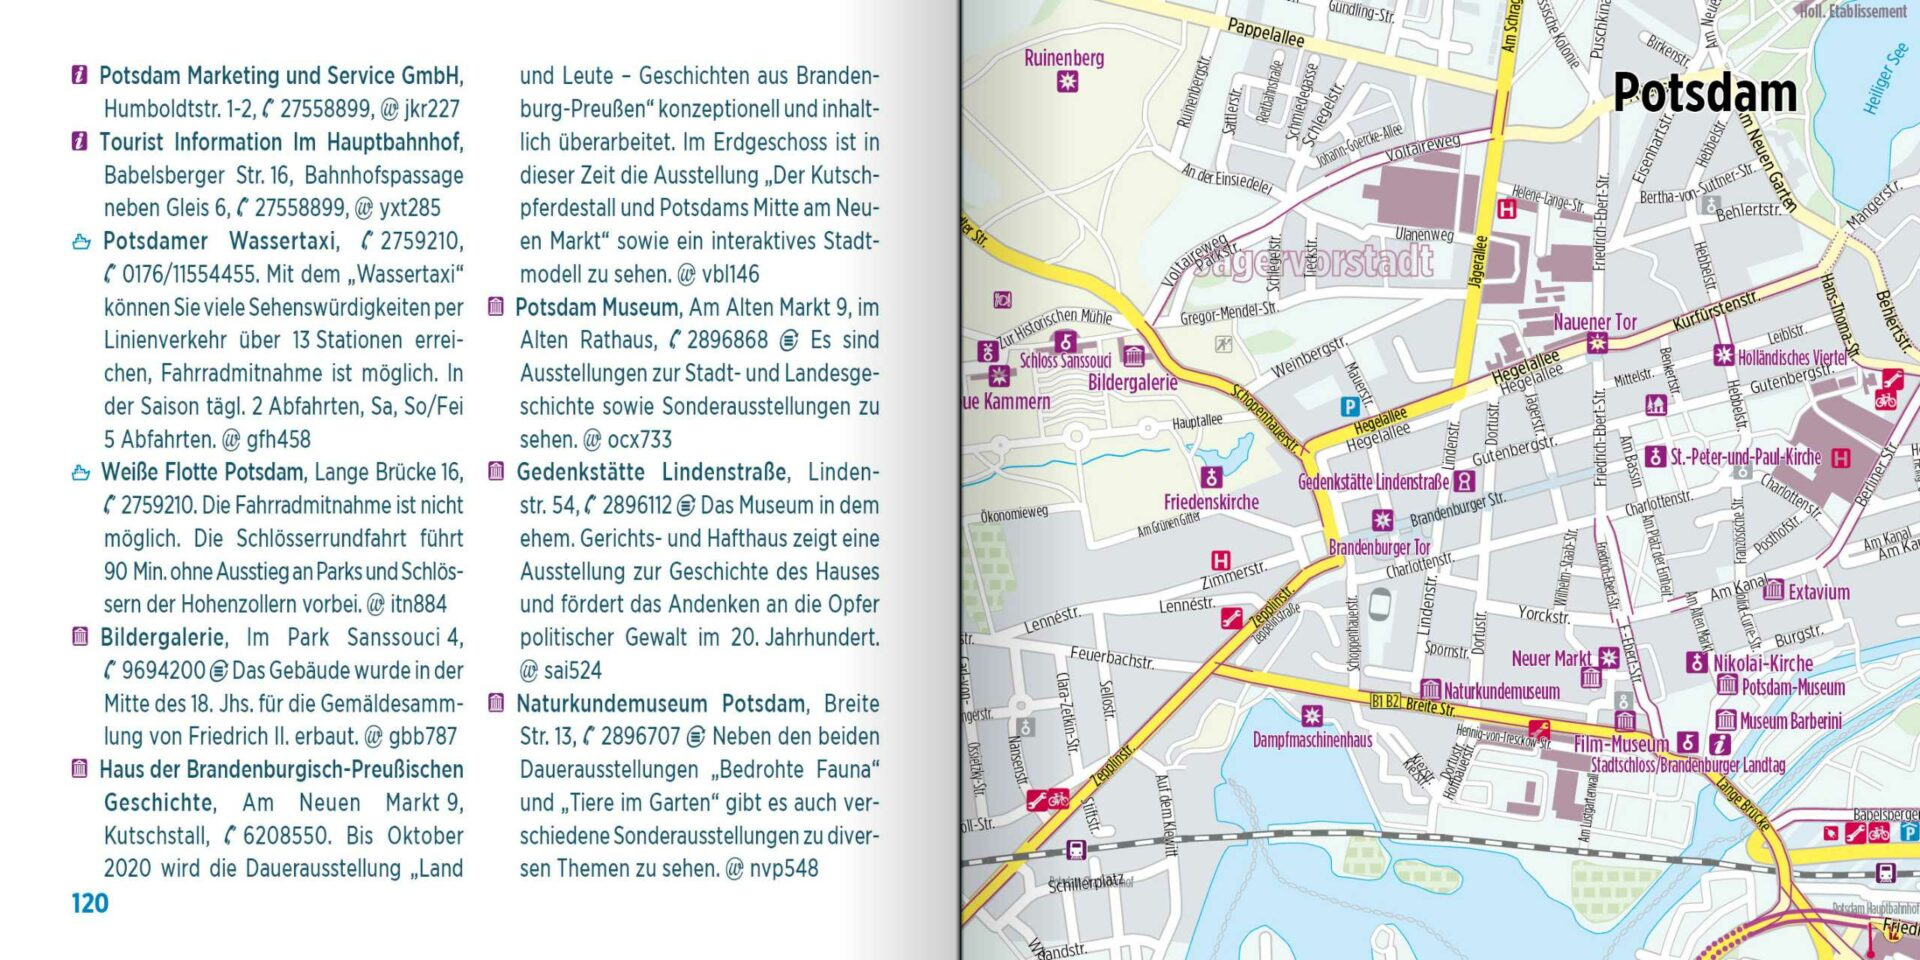 Radtourenbuch kompakt - Stadtplan Potsdam